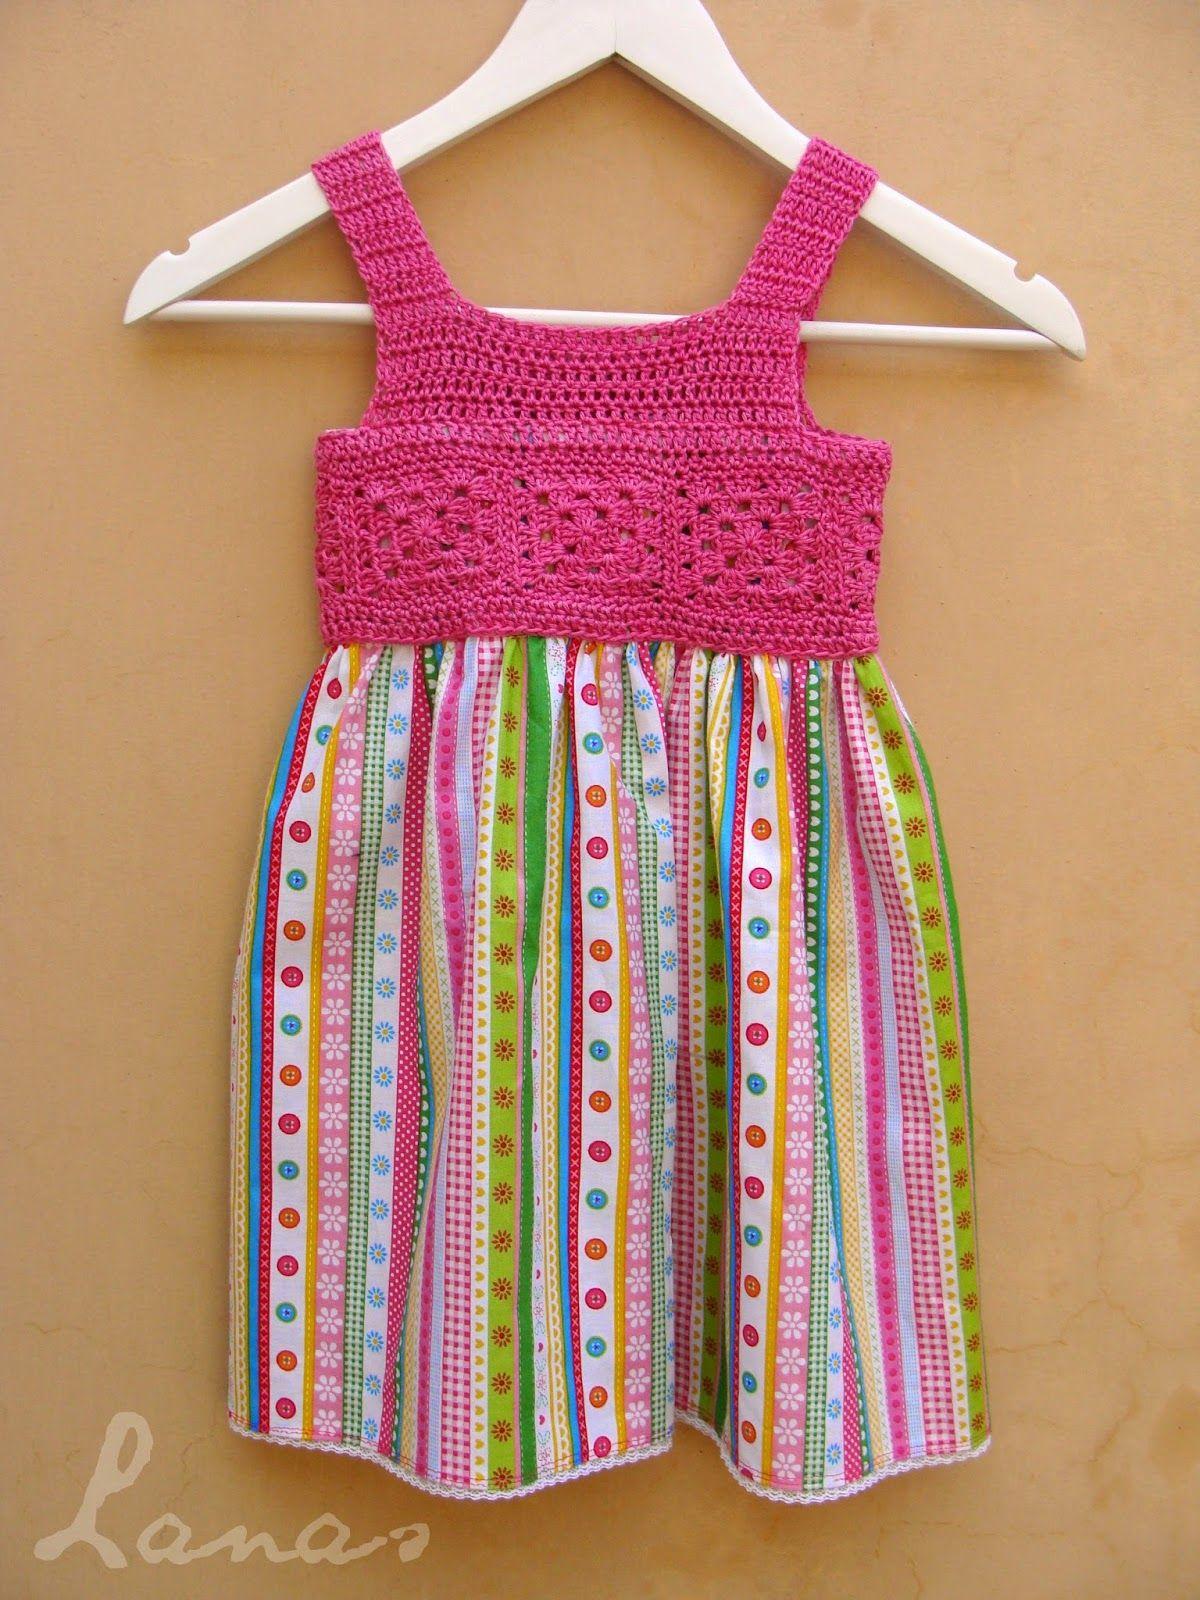 Free Crochet Pattern For Bodice Of Toddler Dress Crafts Crochet